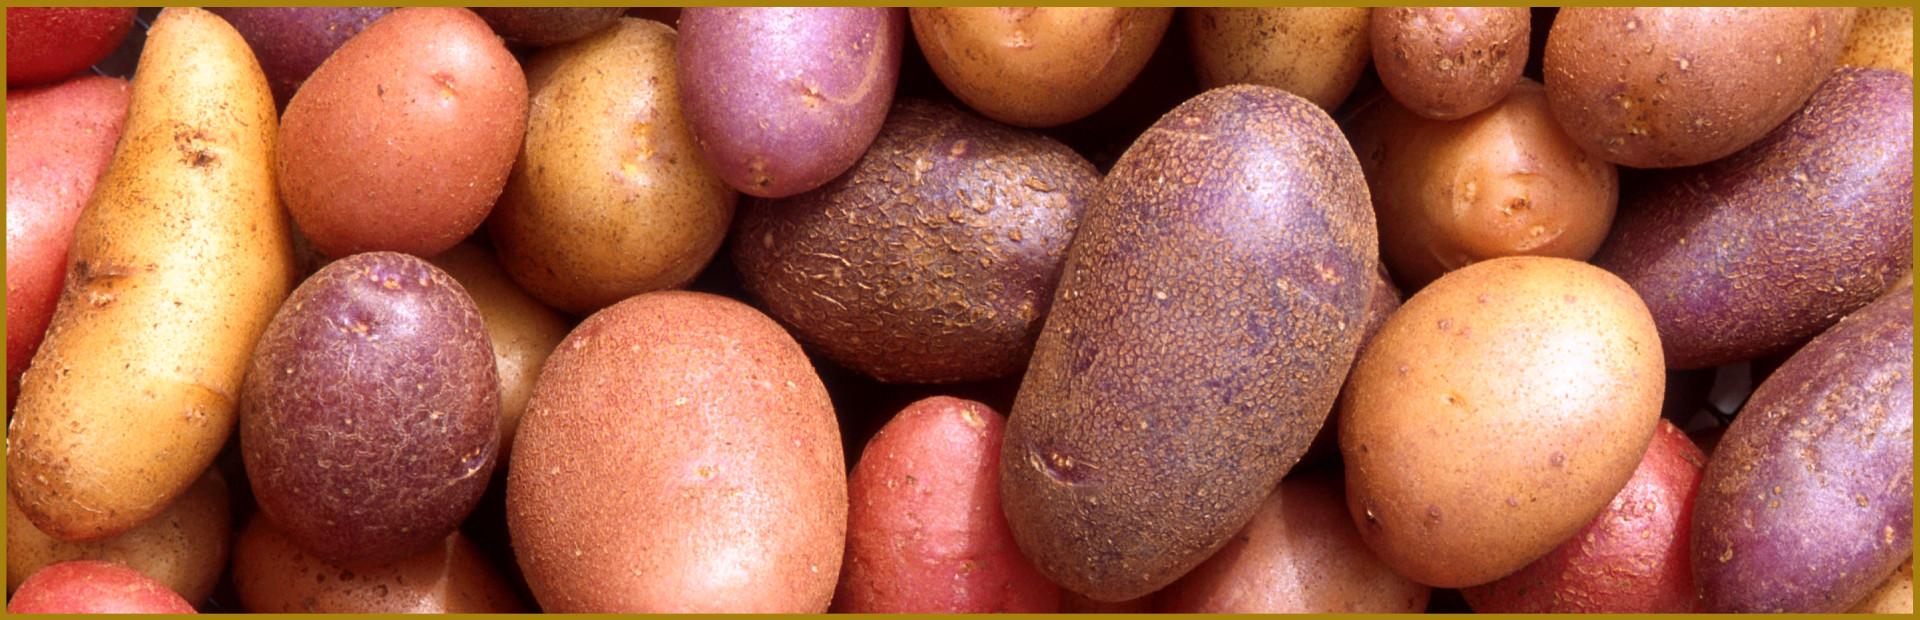 Kühnert Kartoffeldampfschalen